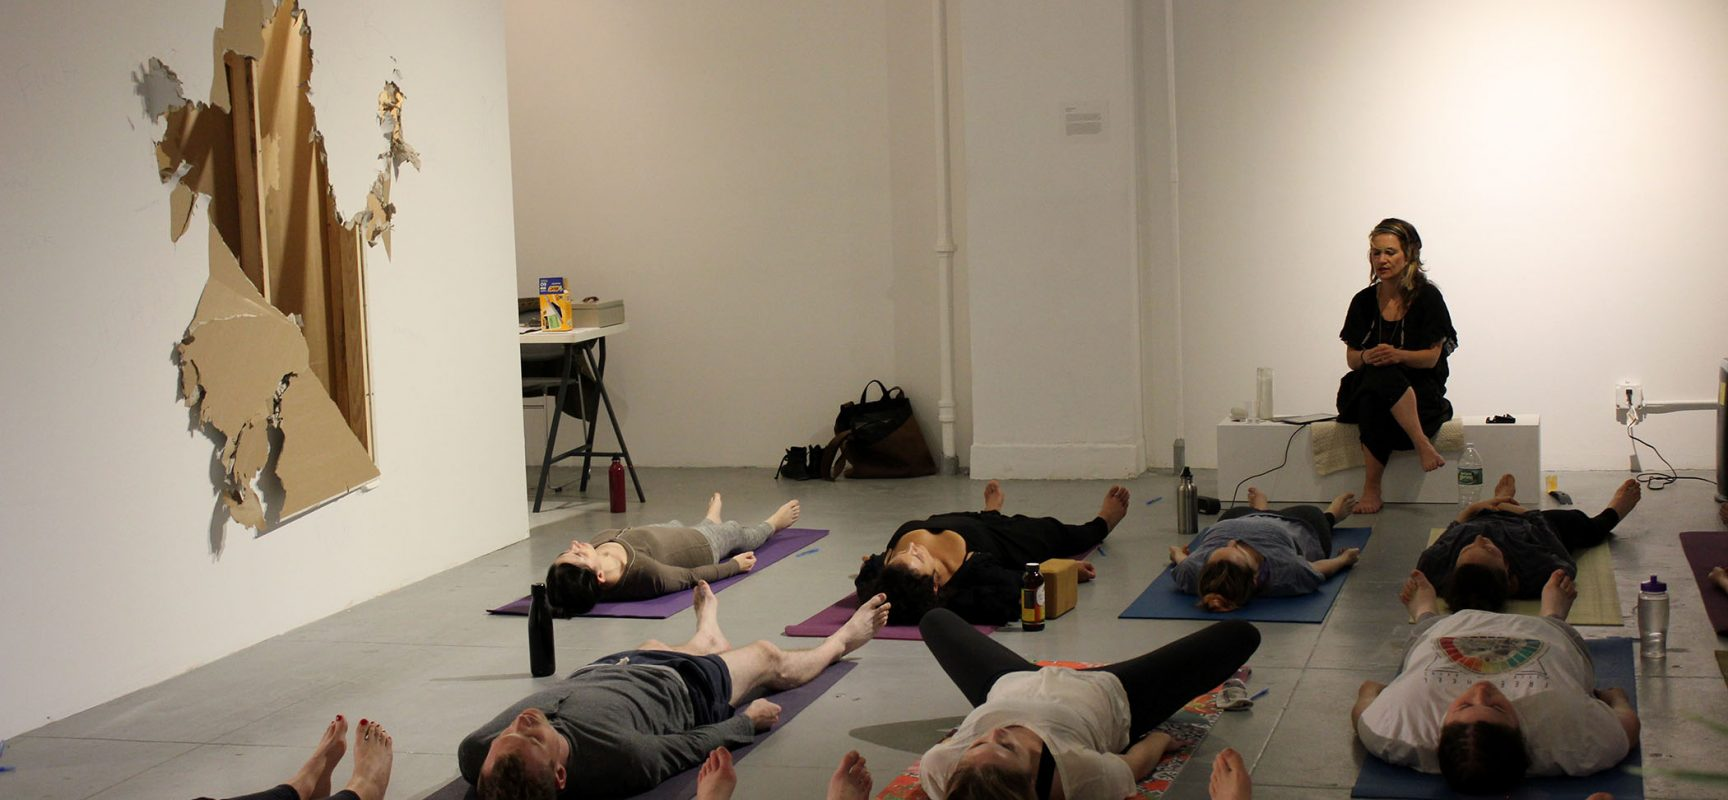 """   Secret Chakra, Feminist Economics Yoga."" Documentation from Feminist Economics Yoga Workshop at EFA Project Space, NYC 2017. Images Courtesy of the Artist."